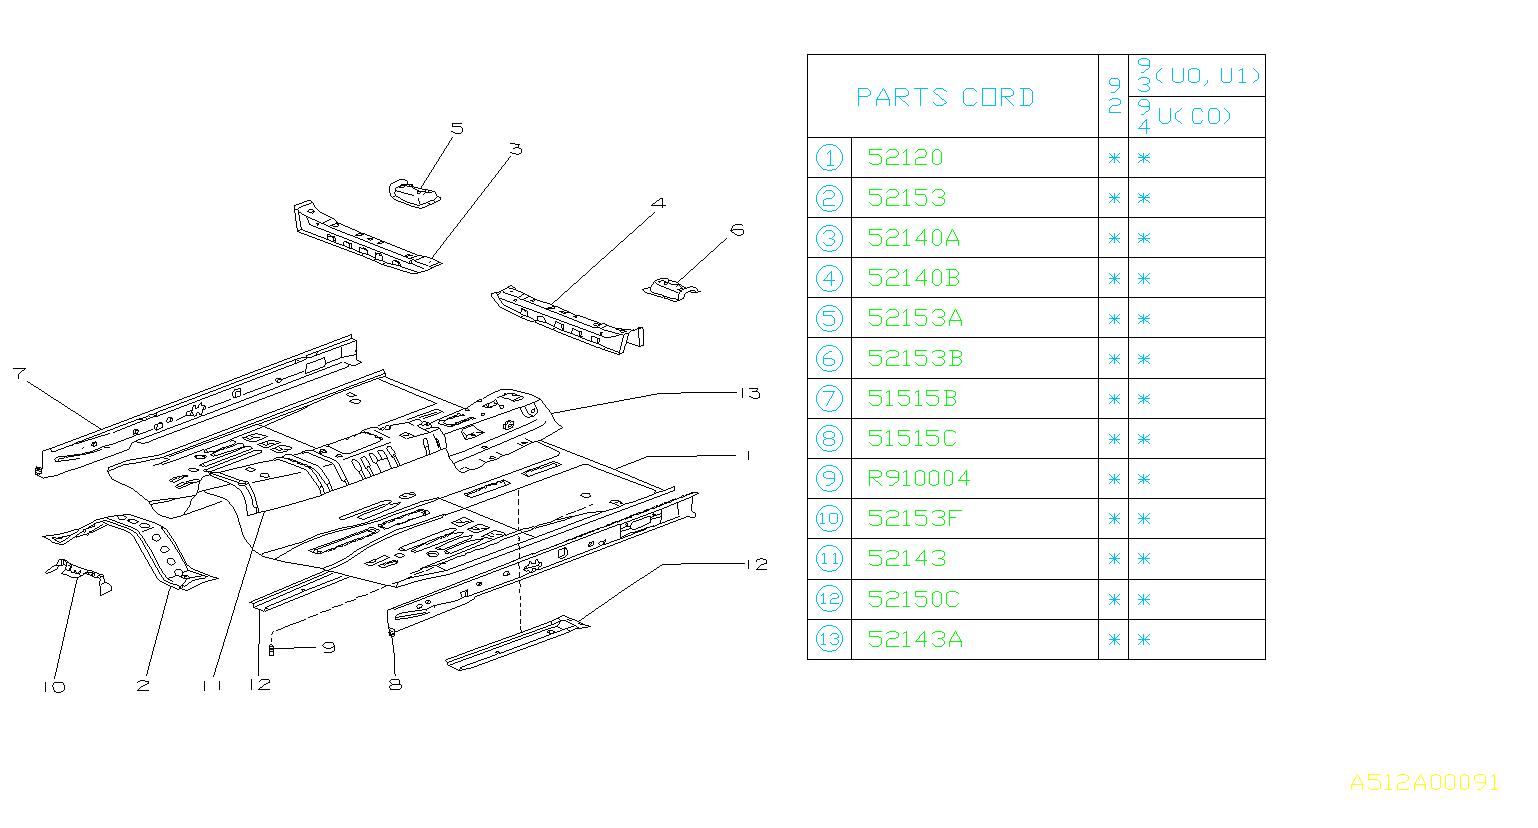 52153PA100 likewise Suzuki Verona Transmission Parts Diagram as well 132 2 besides Chrysler Crossfire Parts Diagram besides Coolant Temperature Sensor How Work. on subaru svx parts diagram